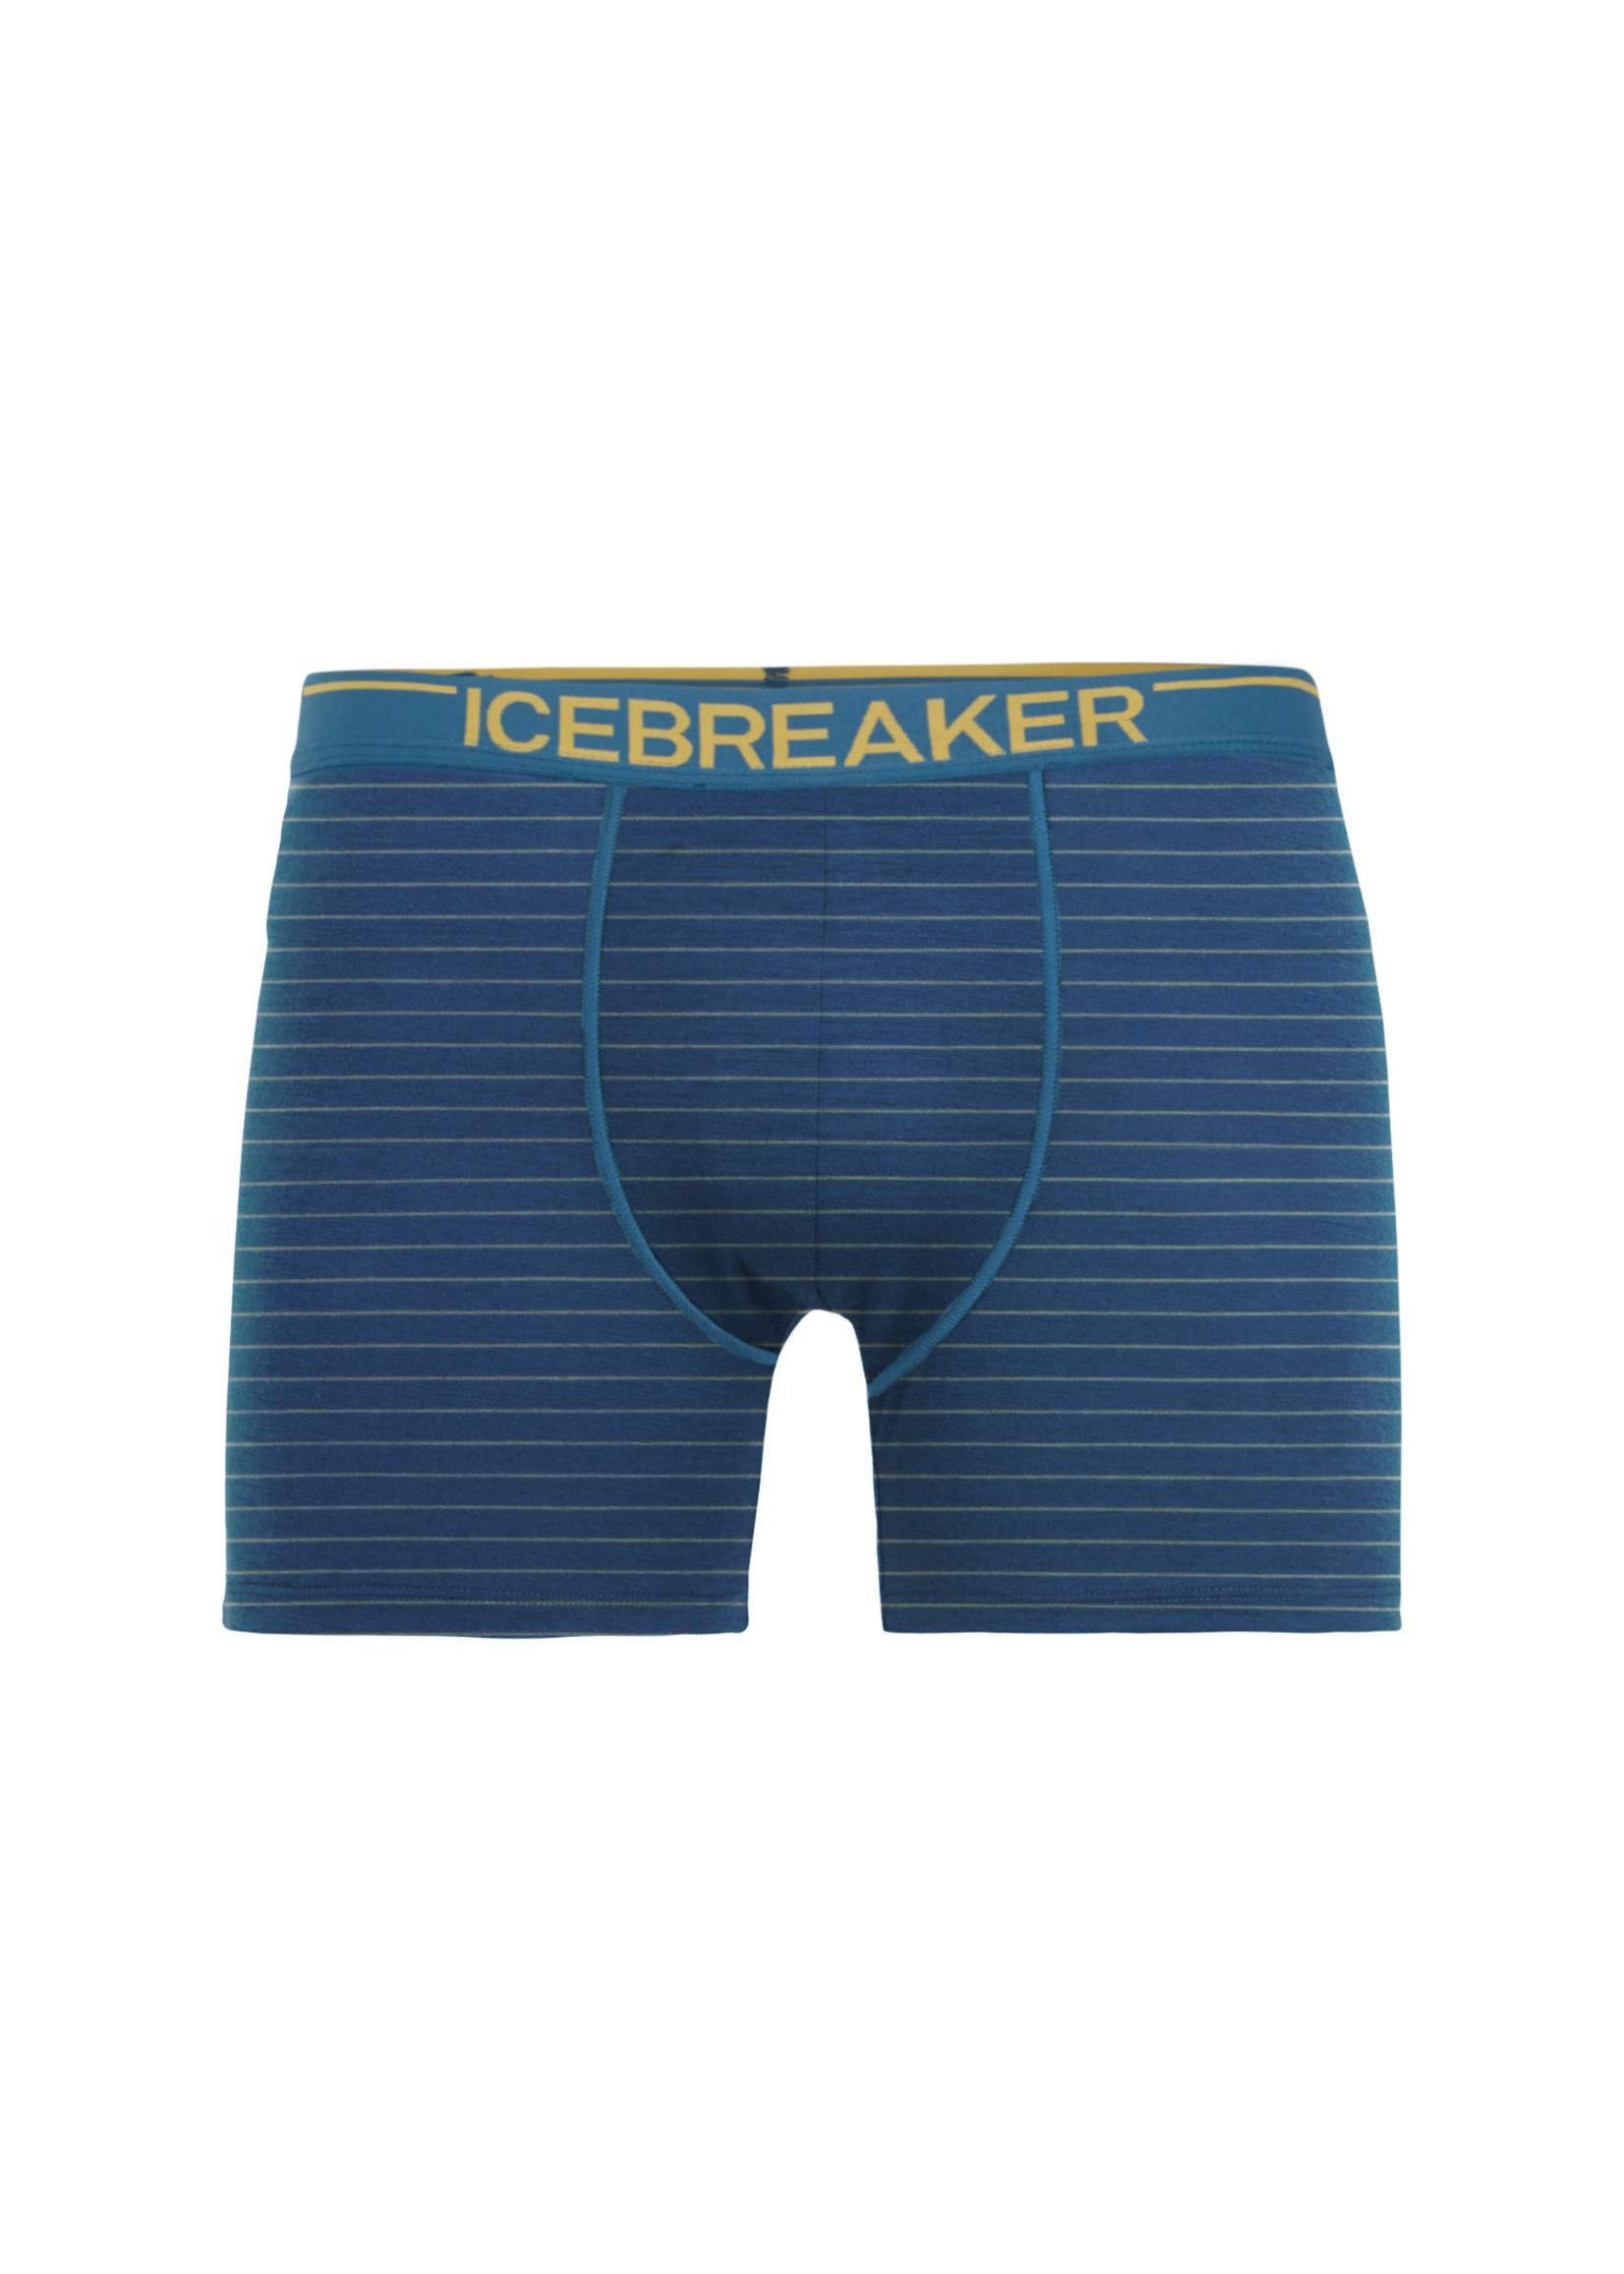 ICEBREAKER Boxer Anatomica / Large / Bleu